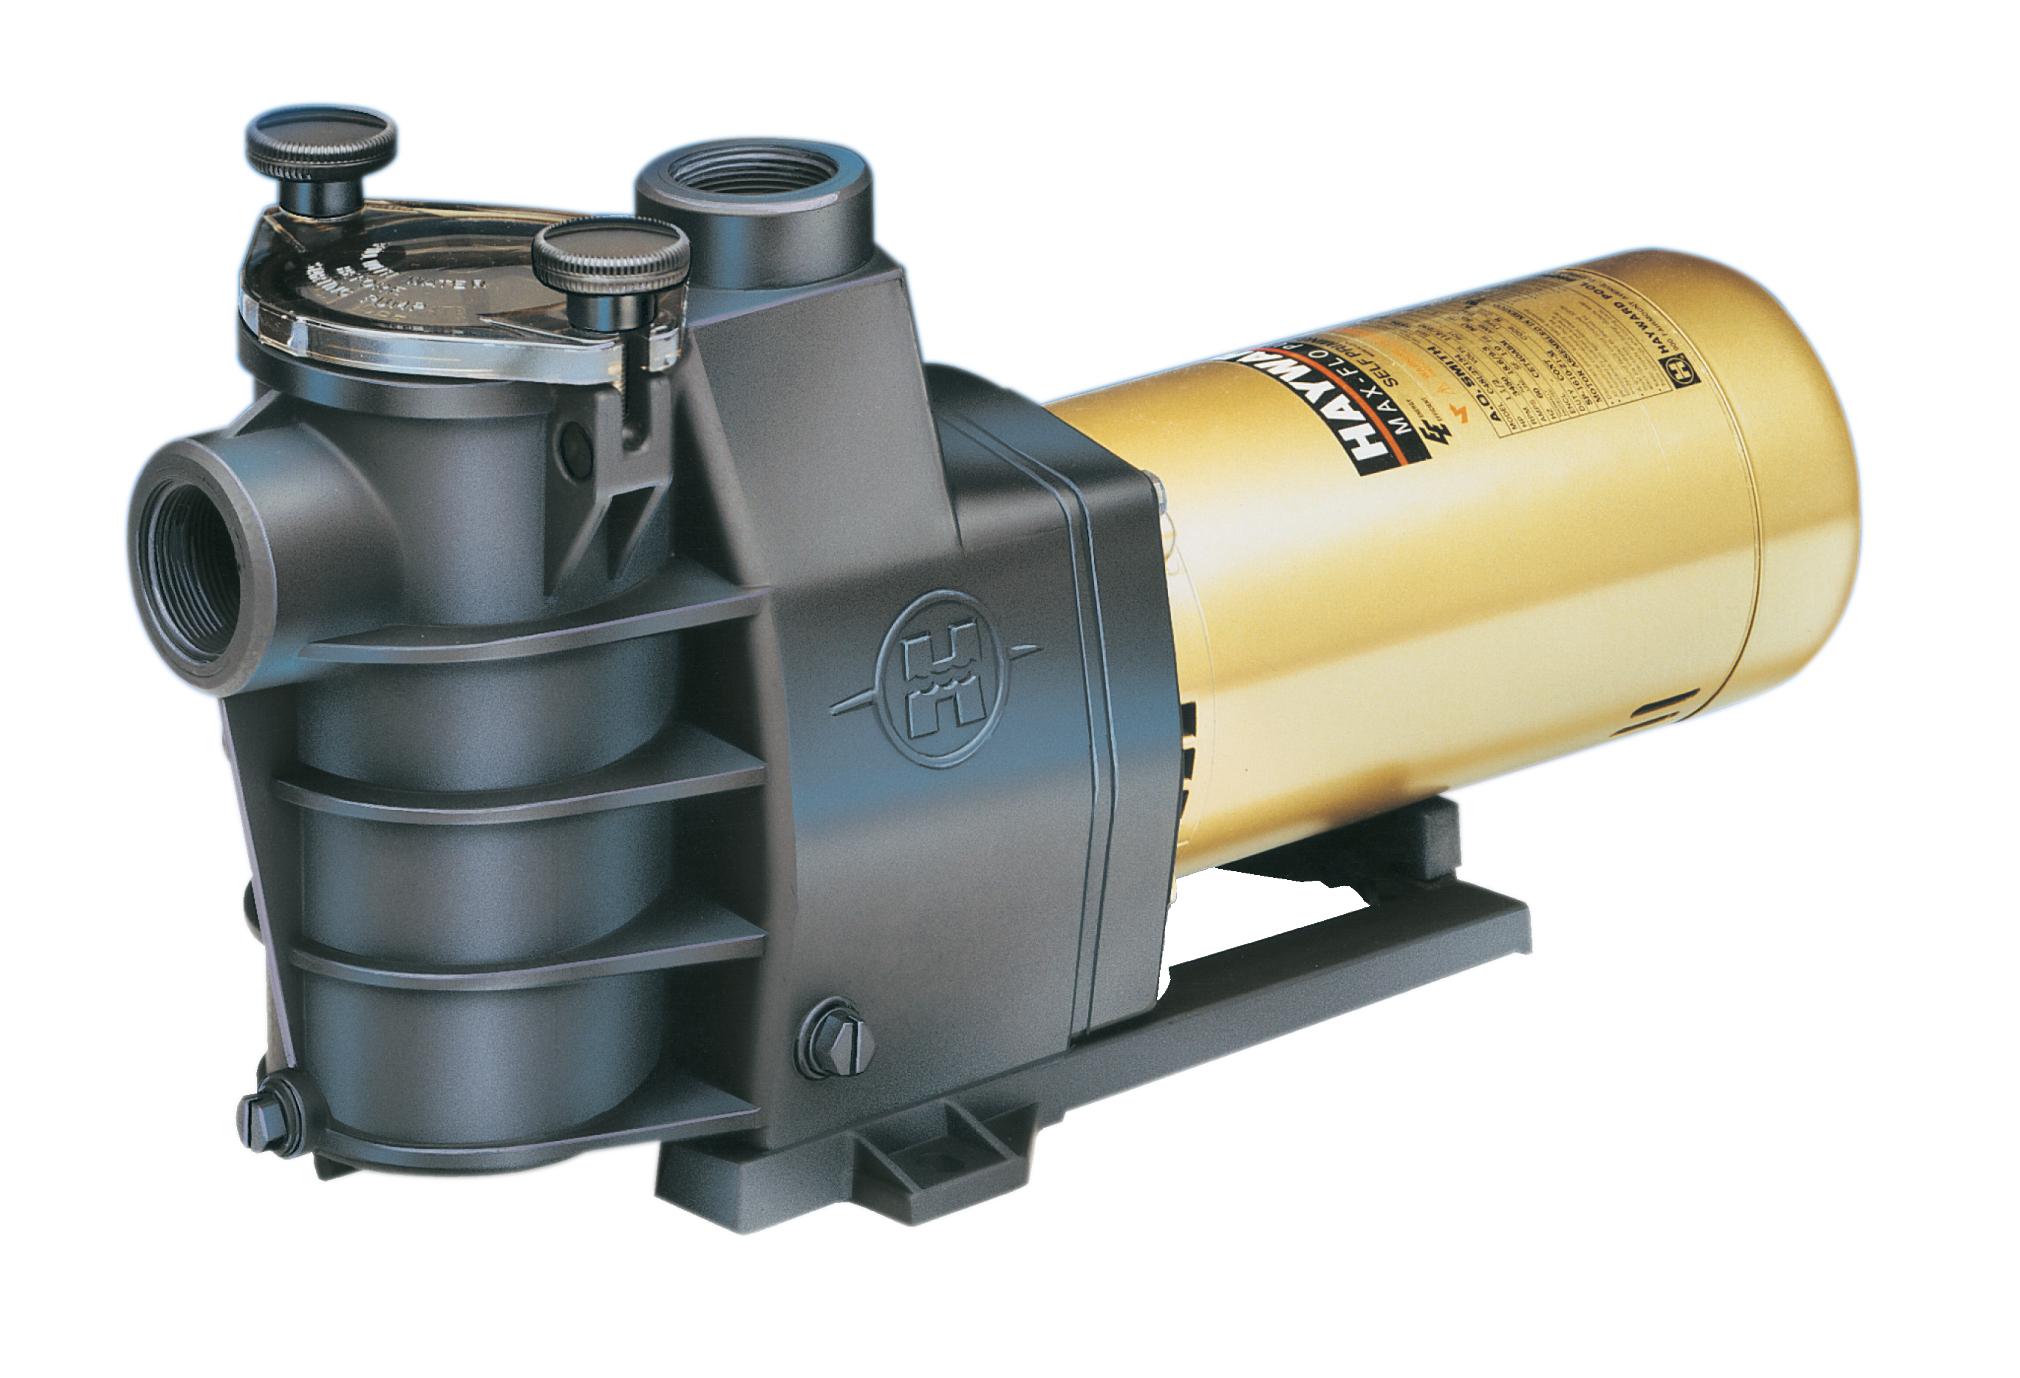 Hayward max flo pump 3 4 hp - Hayward swimming pool ...